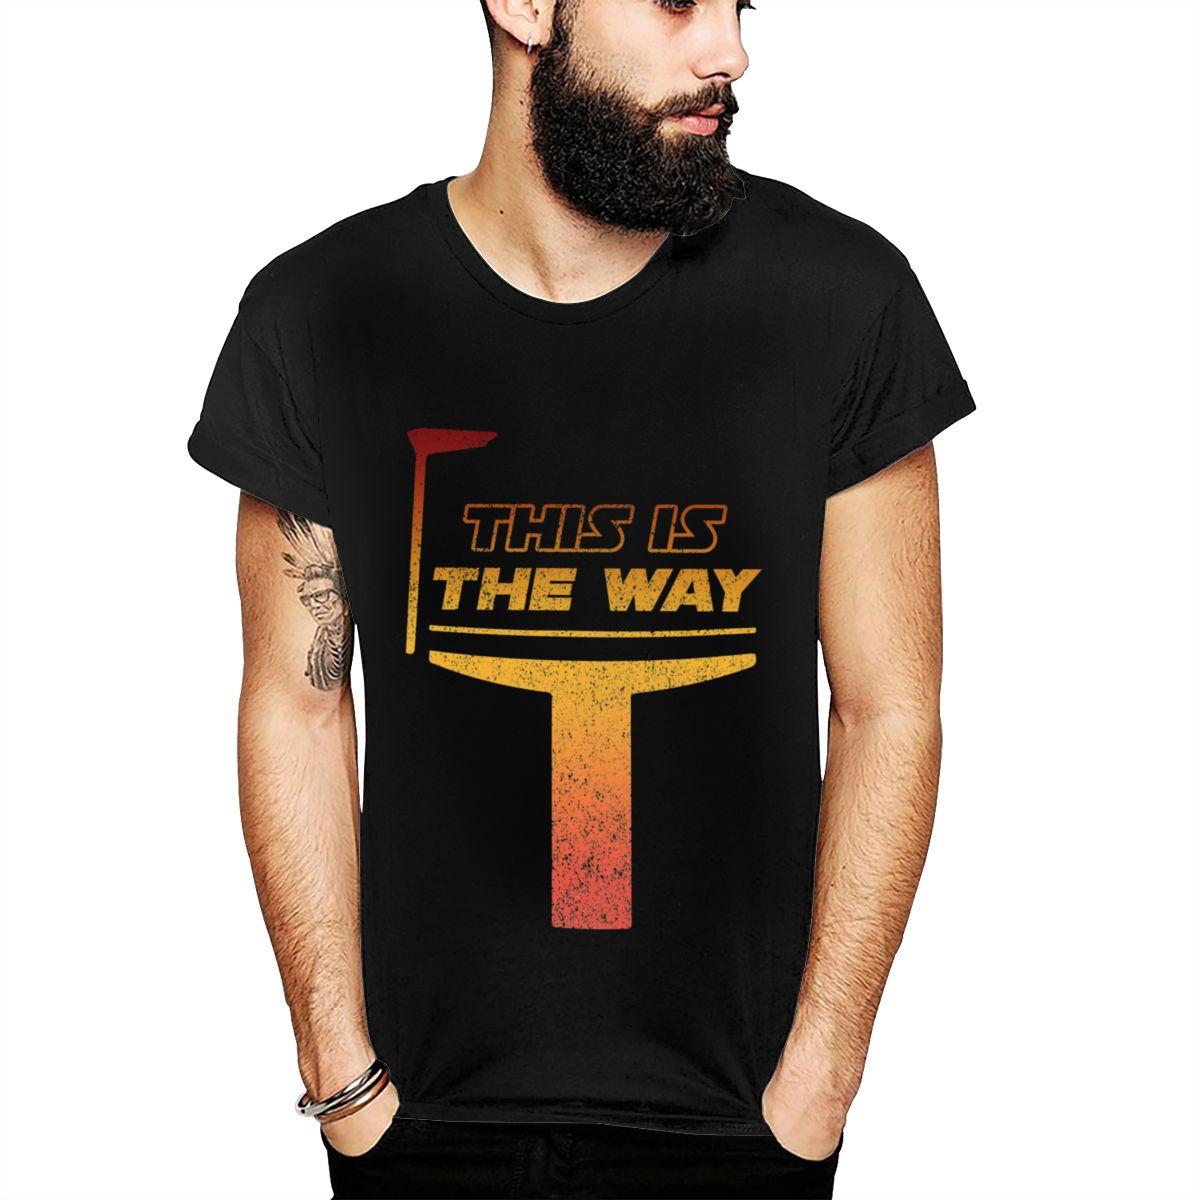 Mandalorian Star Wars 이것은 길 셔츠 공간 Mando Bounty Cool T 셔츠입니다.